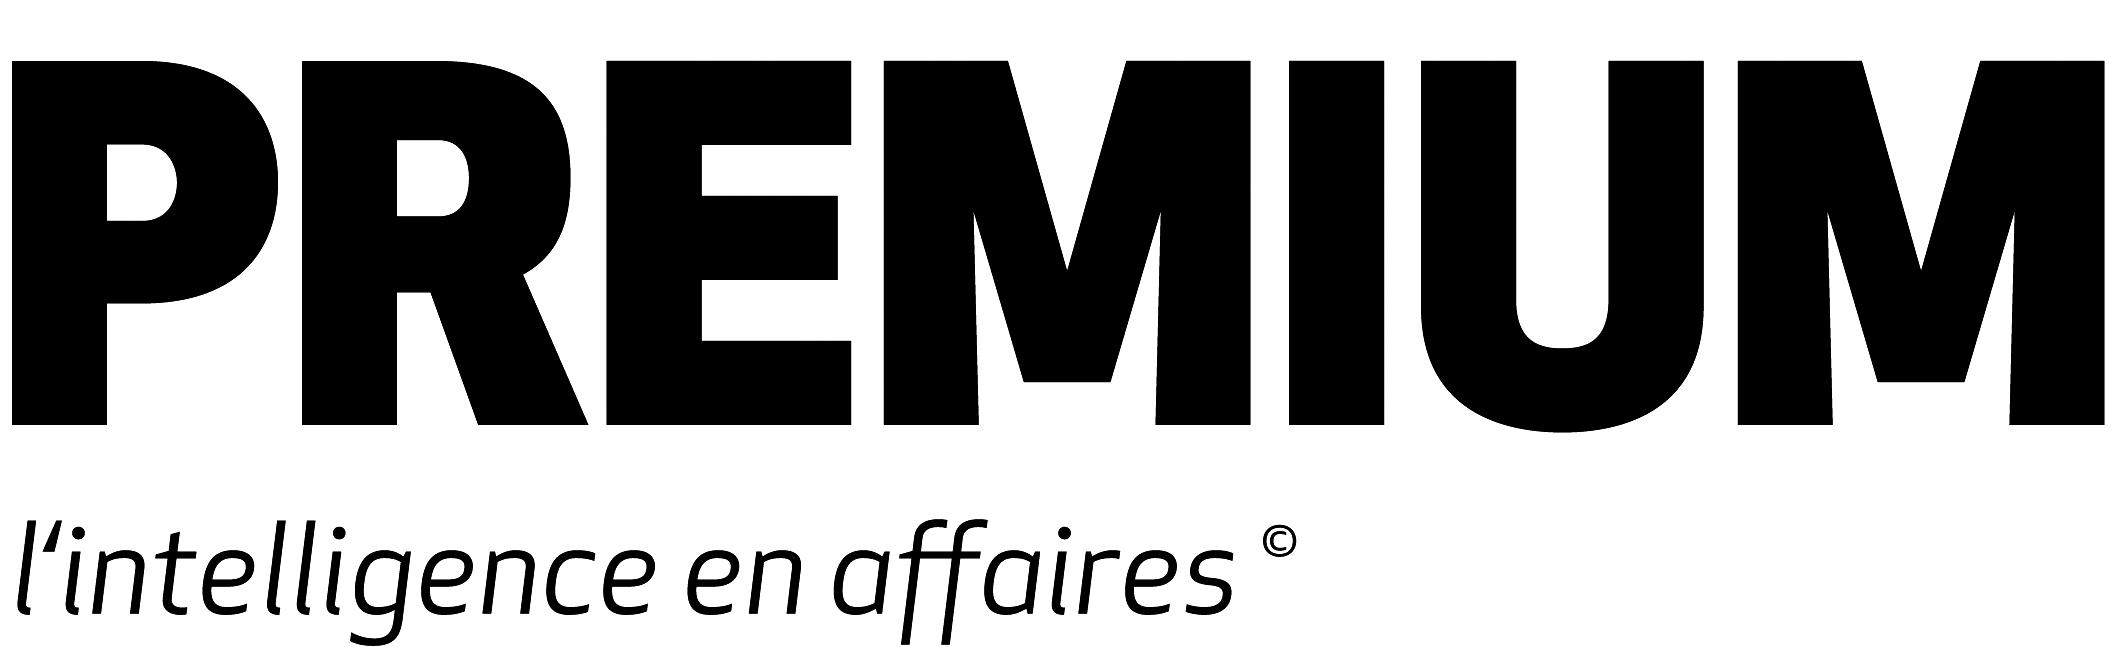 File:Logo premium copyright.jpg - Wikimedia Commons